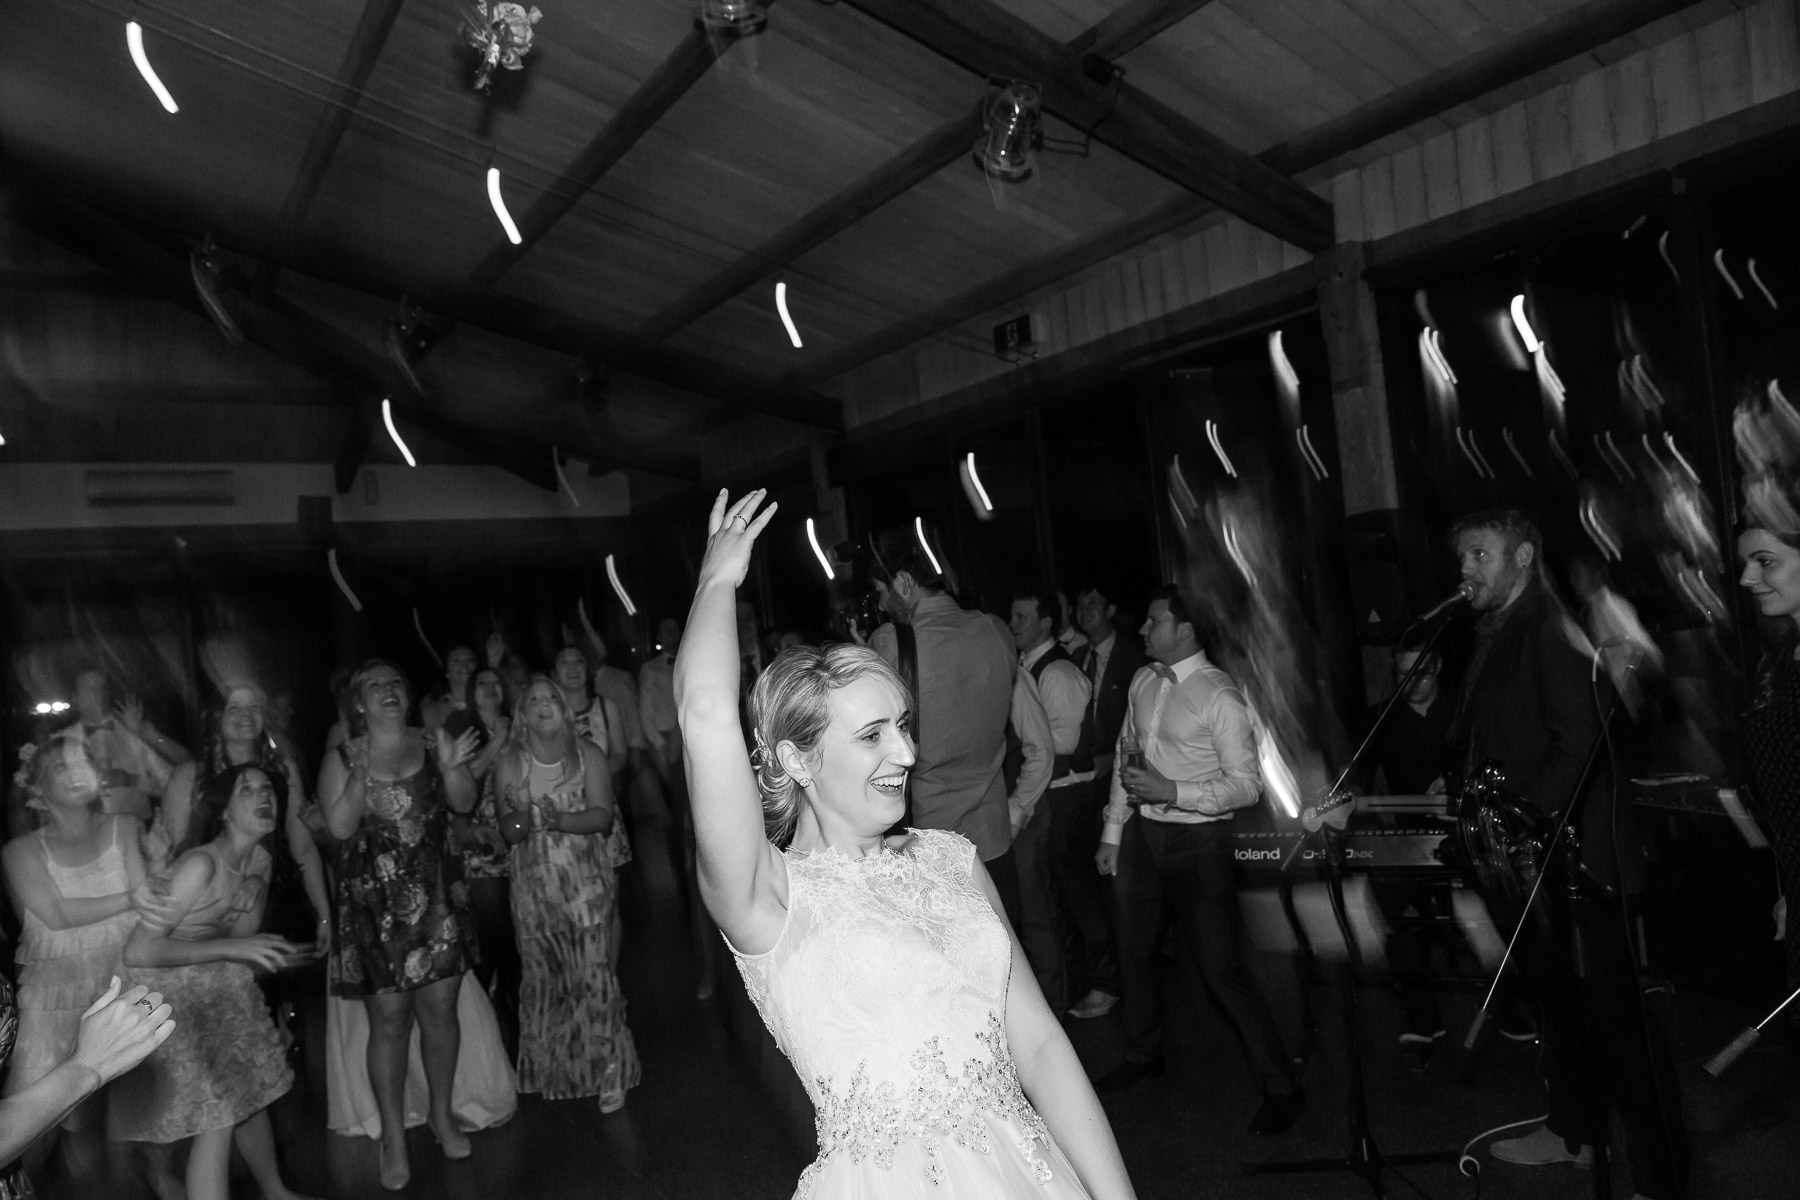 Marnie_and_Charlie_Yarra_Valley_Wedding_Blog-107.jpg